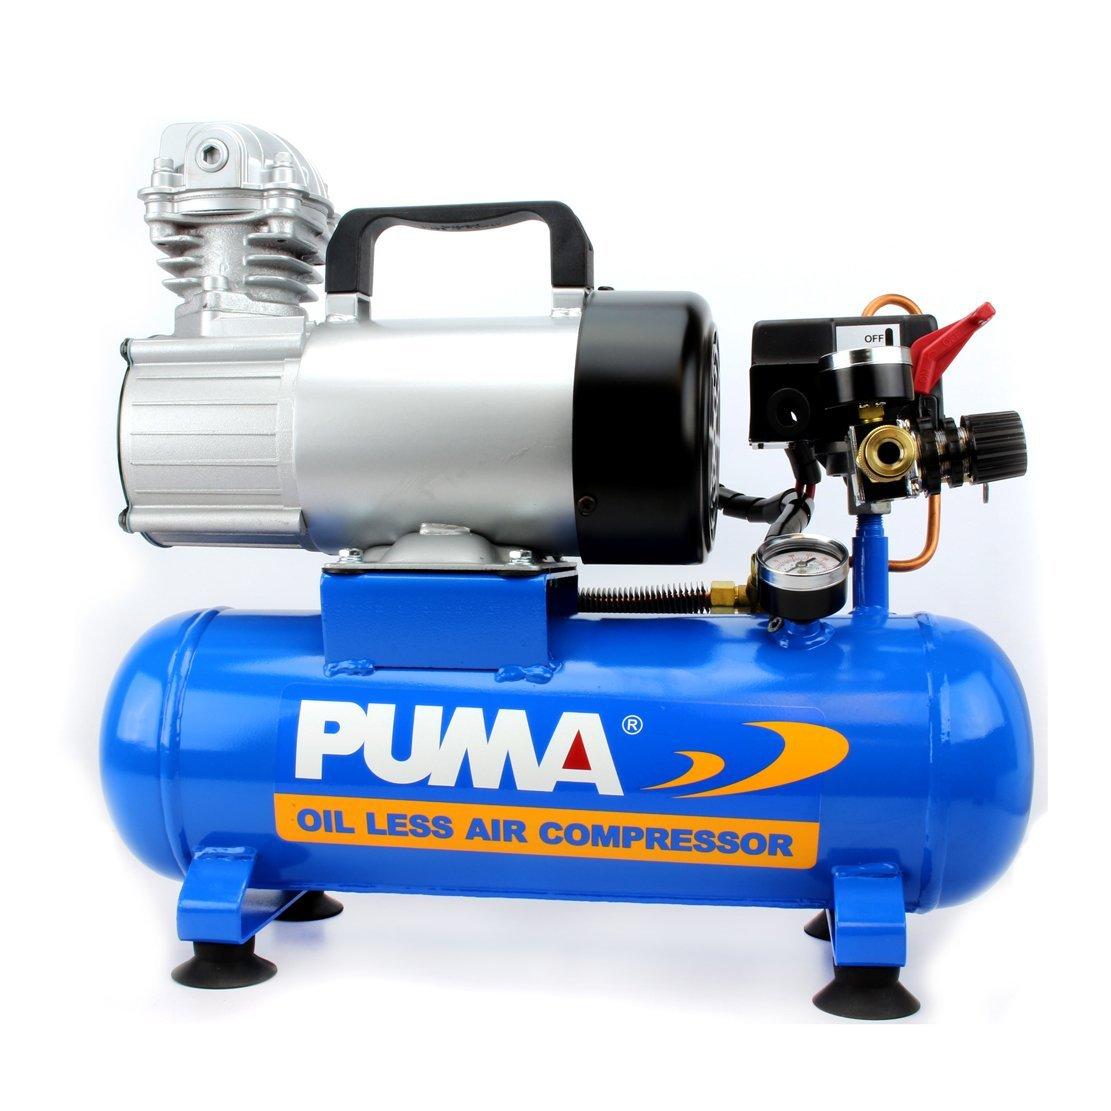 Puma Industries PD1006 Air Compressor, Professional D.C. Direct Drive Oil-Less Series, 0.75 hp Running, 135 Maximum psi, 12V/Phase, 1.5 gal, 31 lb.